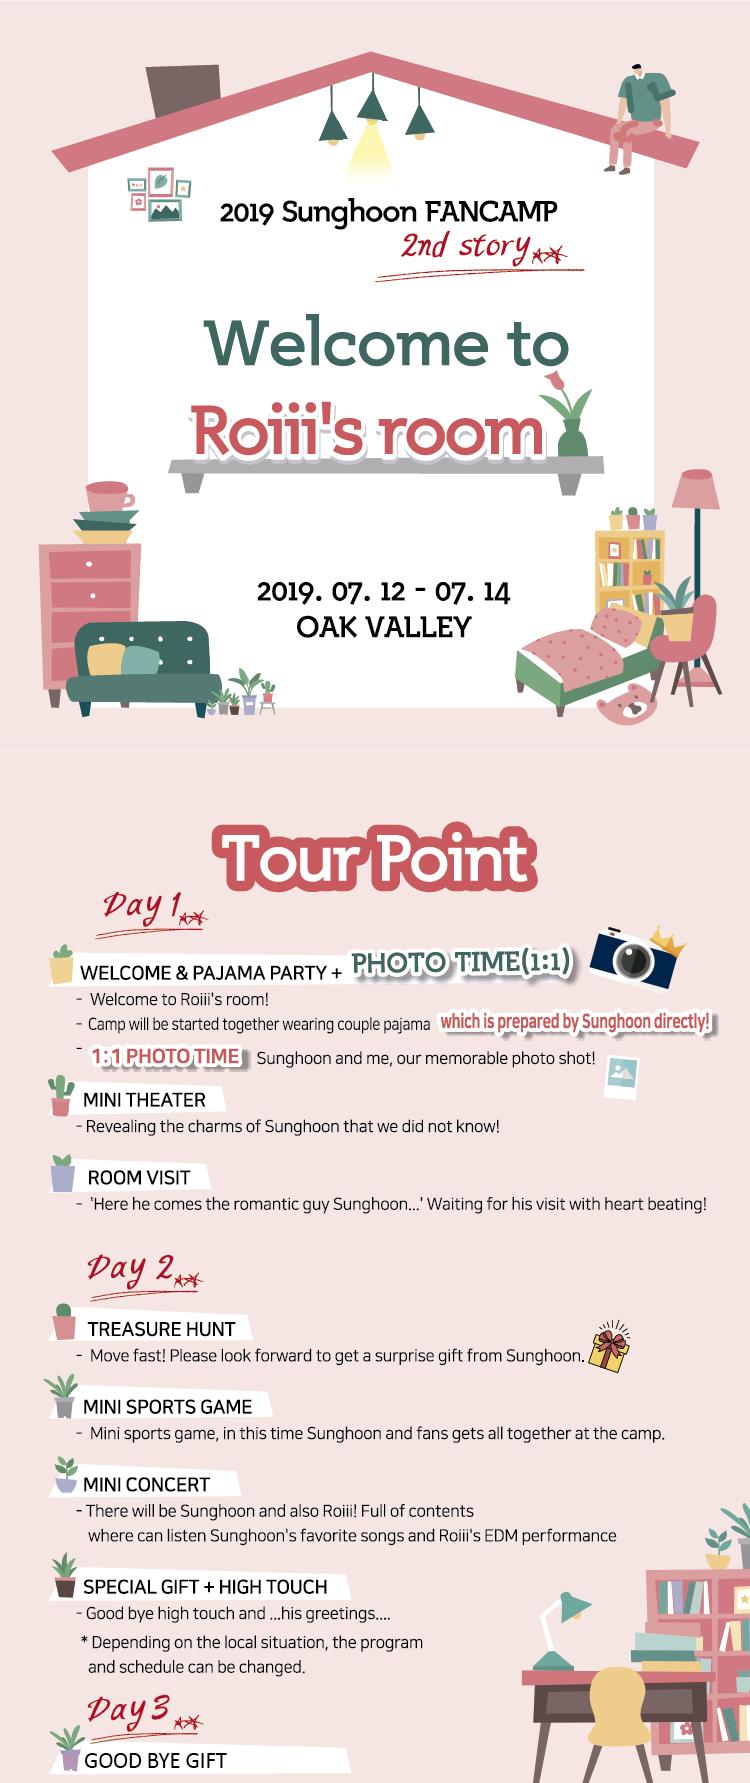 2019 Welcome to Roiii's room (Overseas) : 투어테인먼트